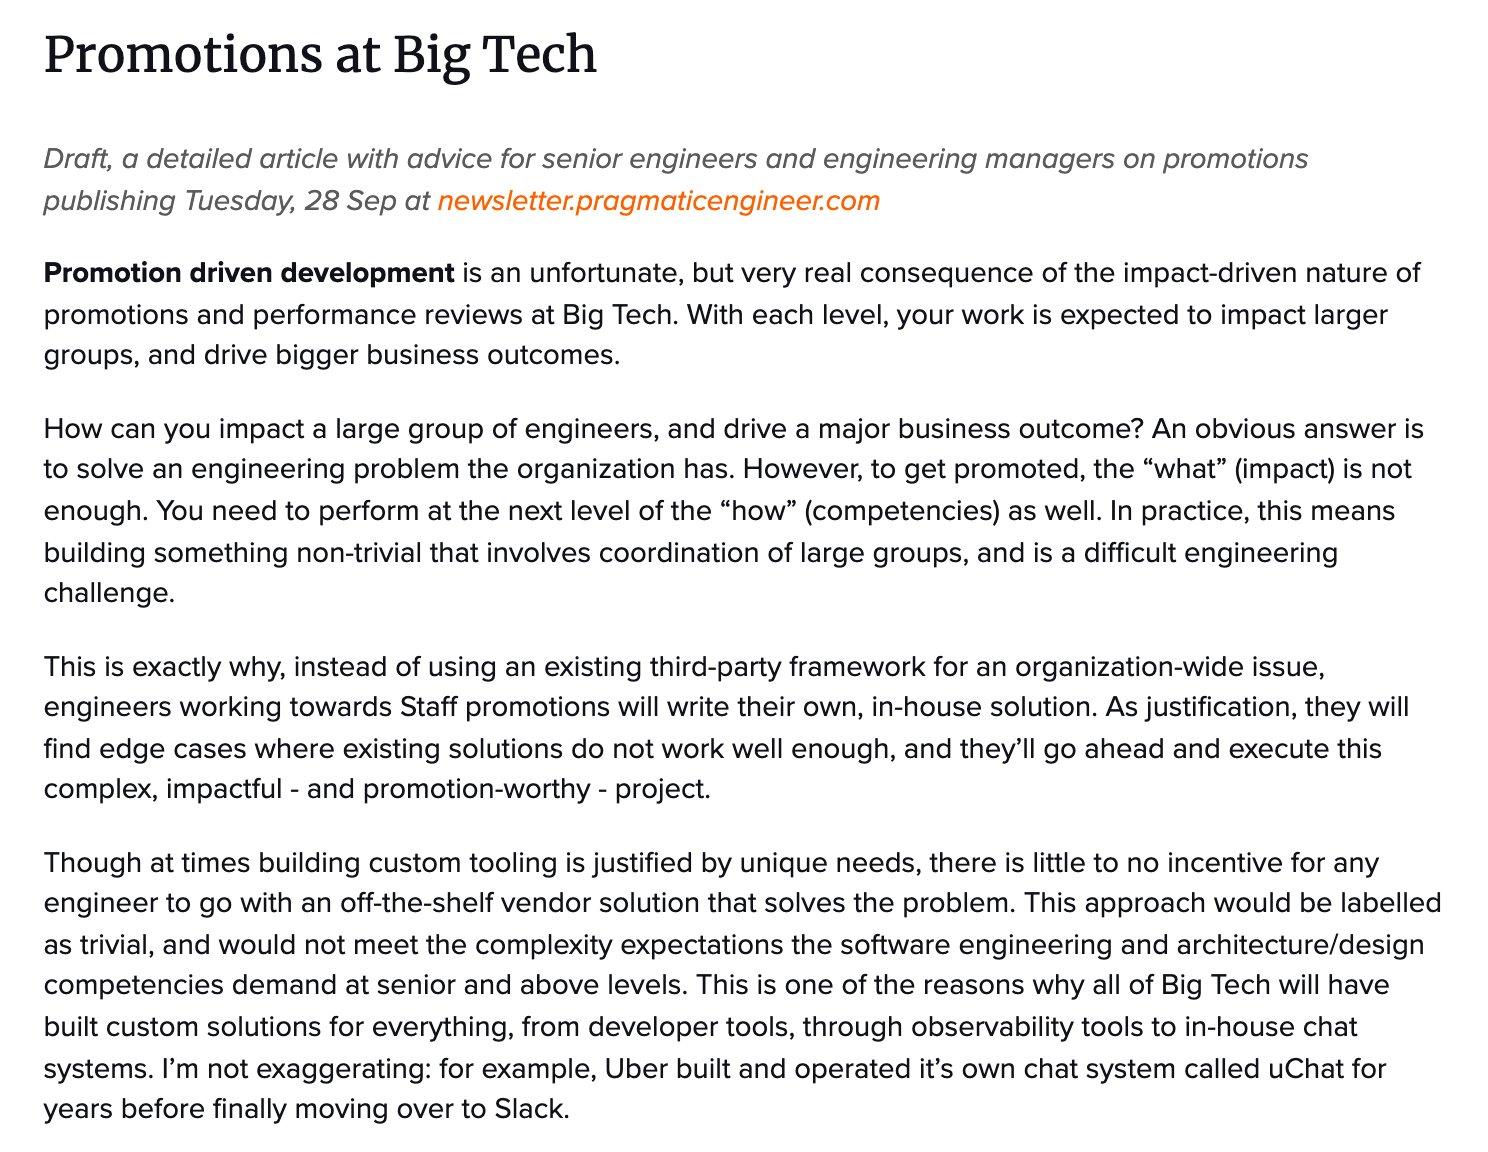 Writing http:// newsletter.pragmaticengineer.com    & @EngGuidebook. Previously @Uber, @Skype, @Microsoft. Books: http:// blog.pragmaticengi